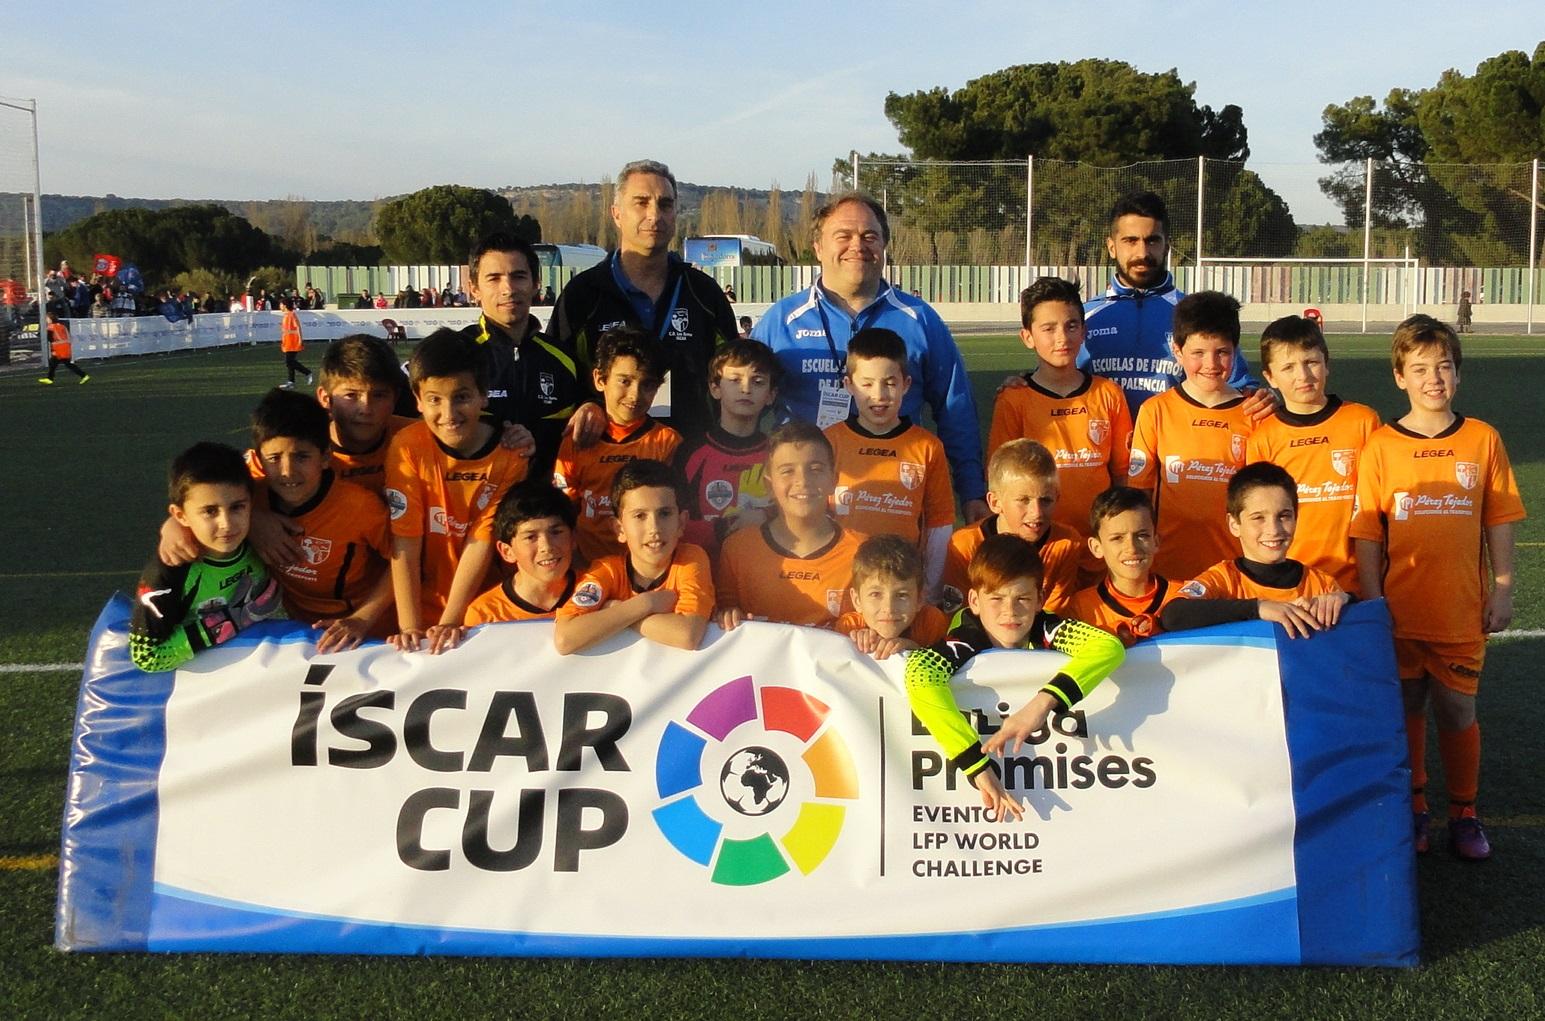 LIGA PROMISES - ÍSCAR CUP